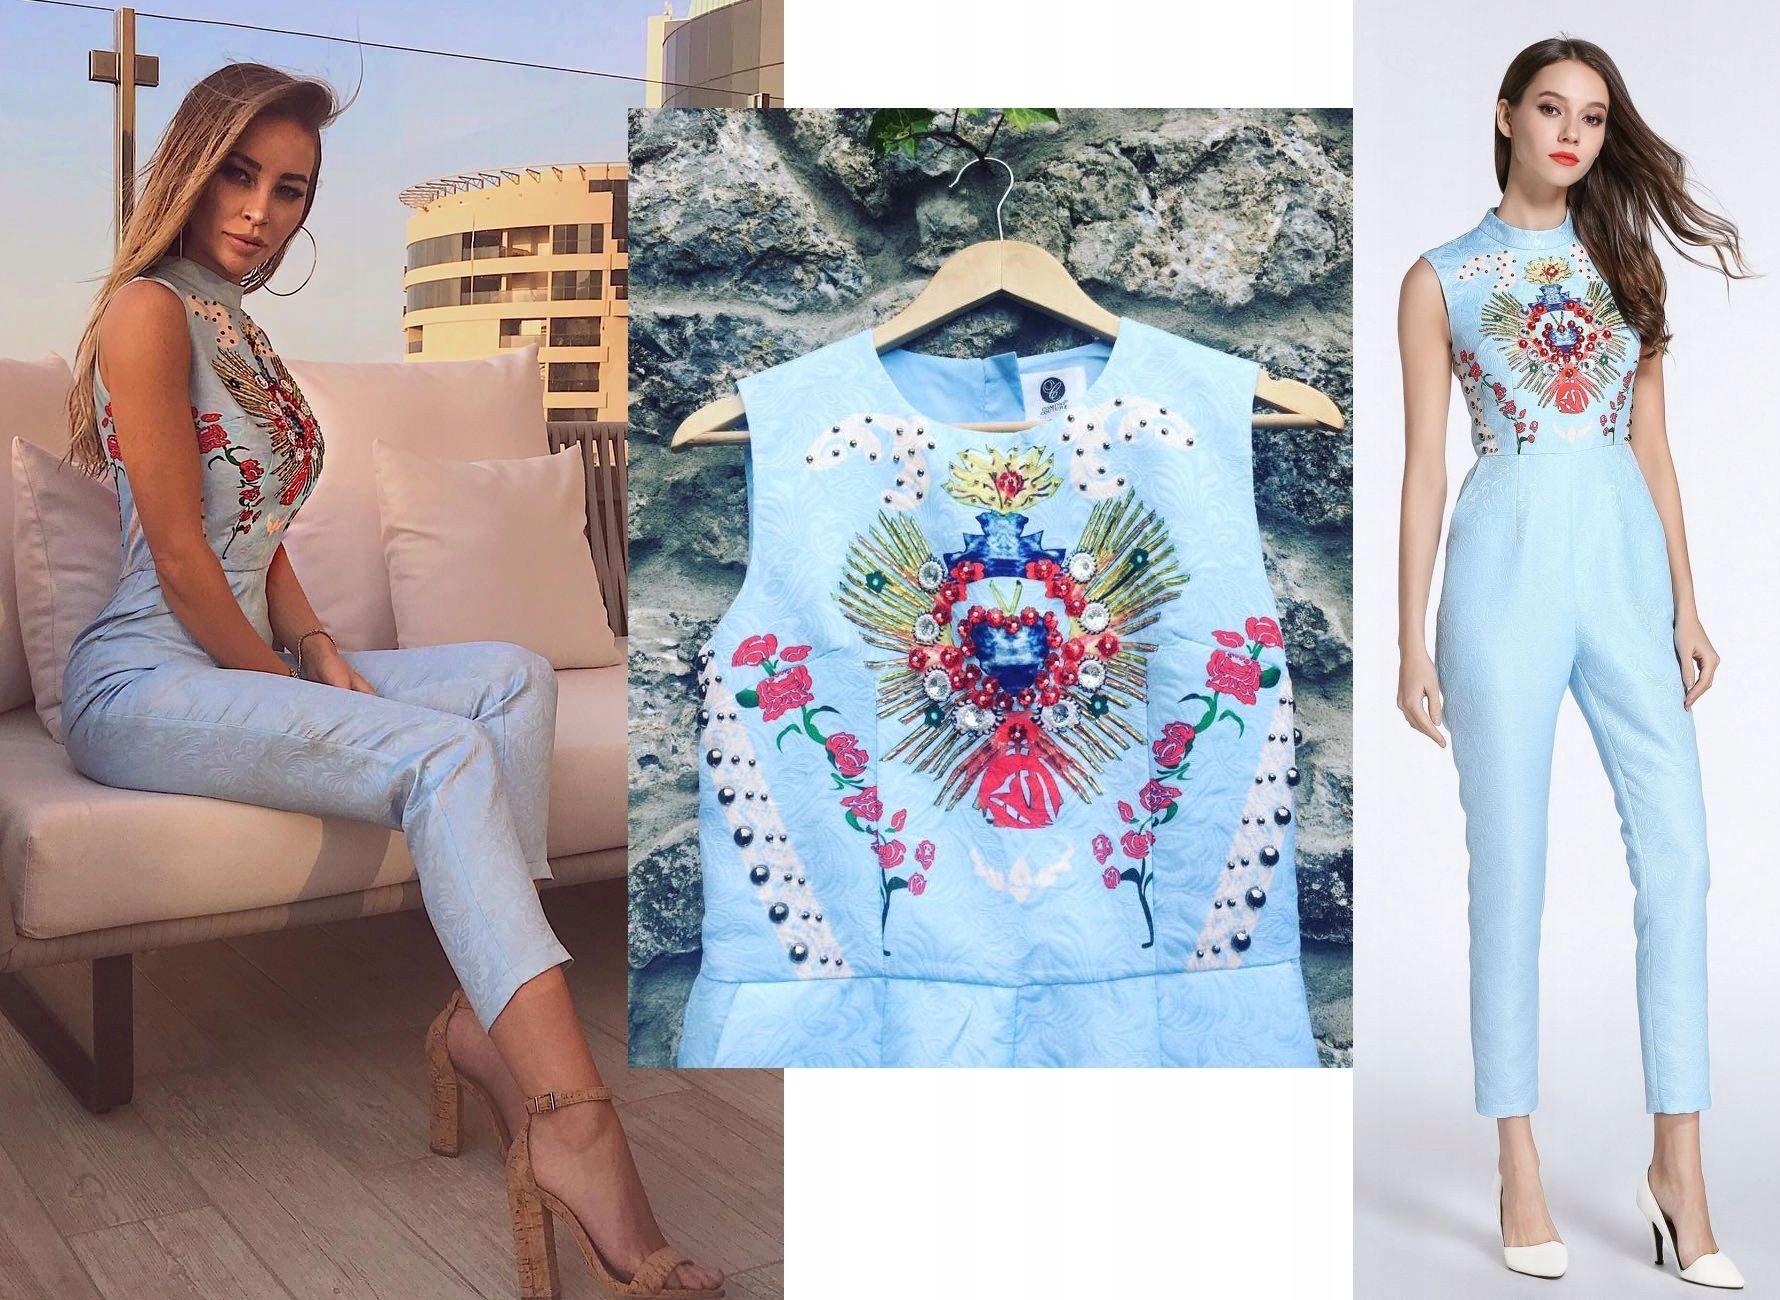 Comino Couture Kombinezon Niebieski Kwiaty 40 L 12 7897857277 Oficjalne Archiwum Allegro Fashion Dresses Cover Up